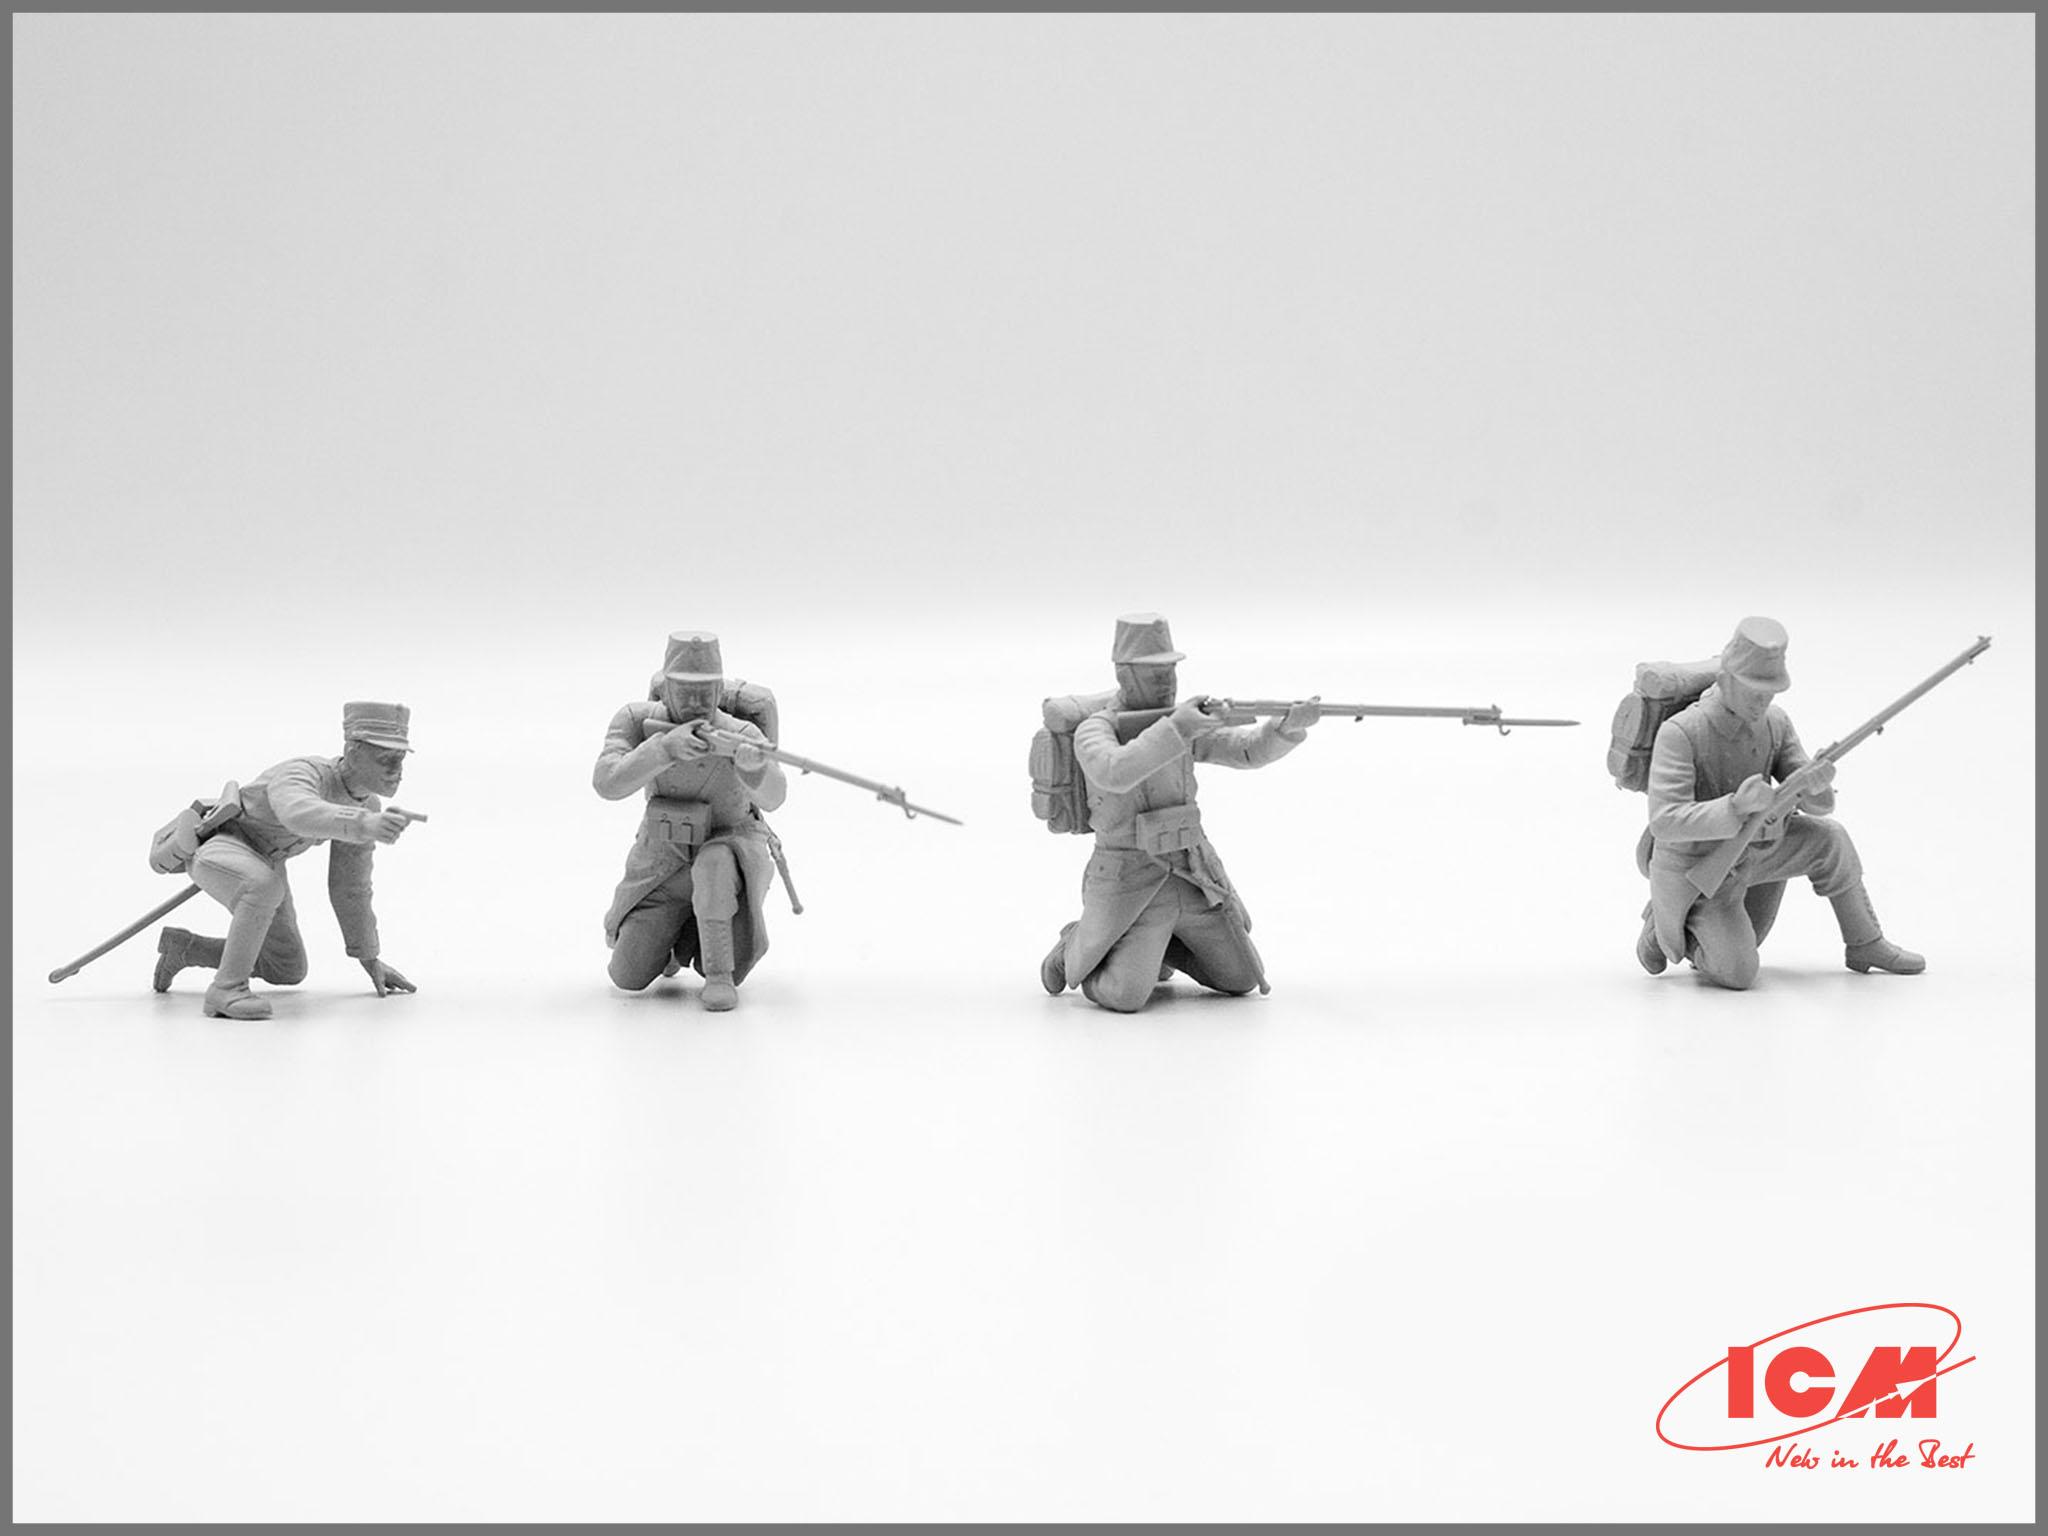 35680_cropped_Belgian_infantry_icm_2